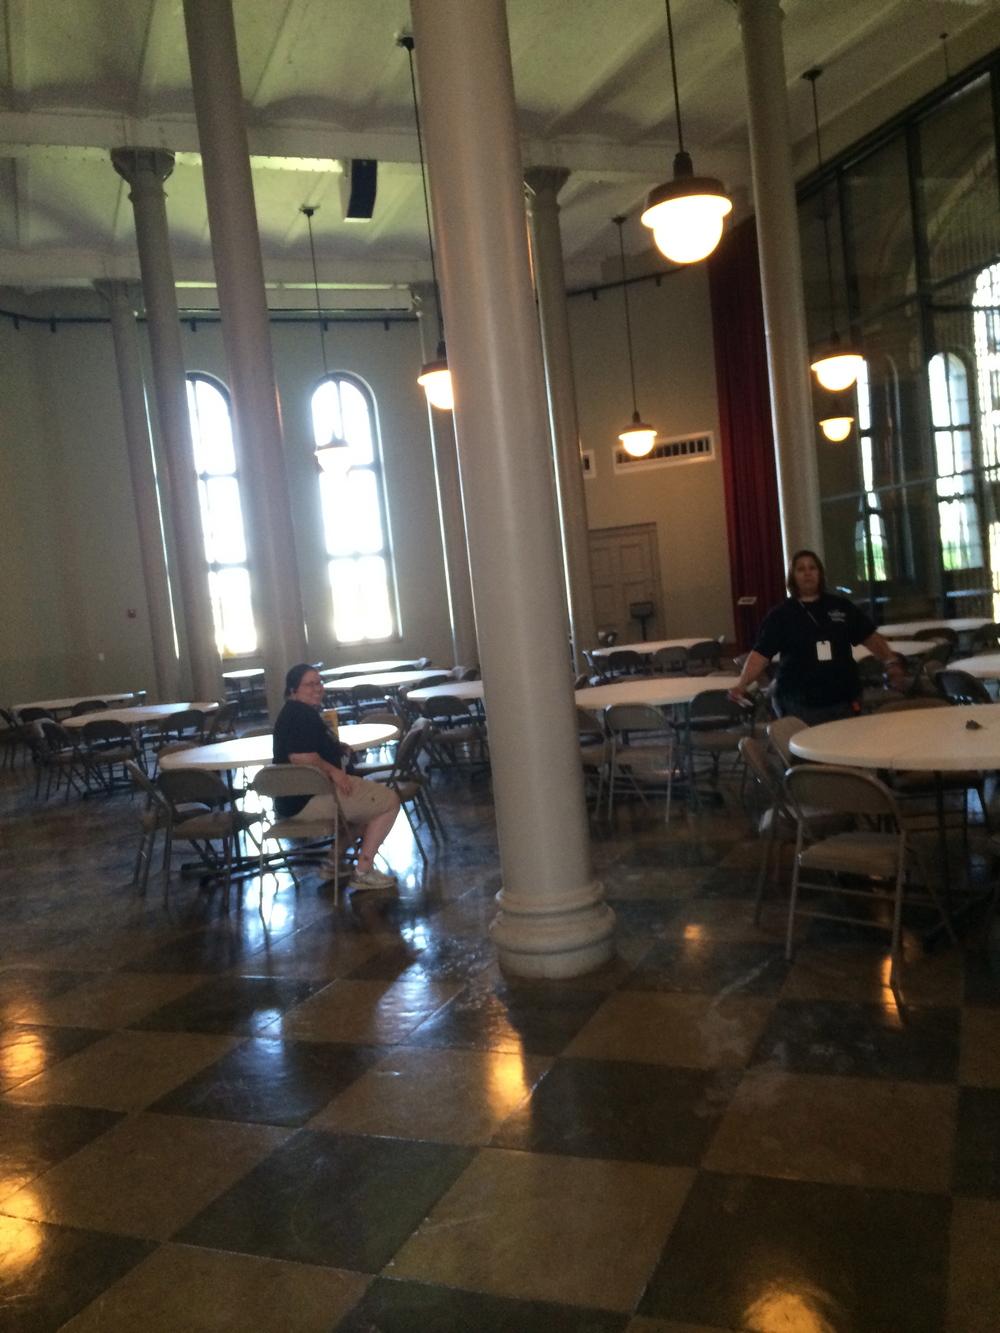 21 - prison cafeteria 2.jpg